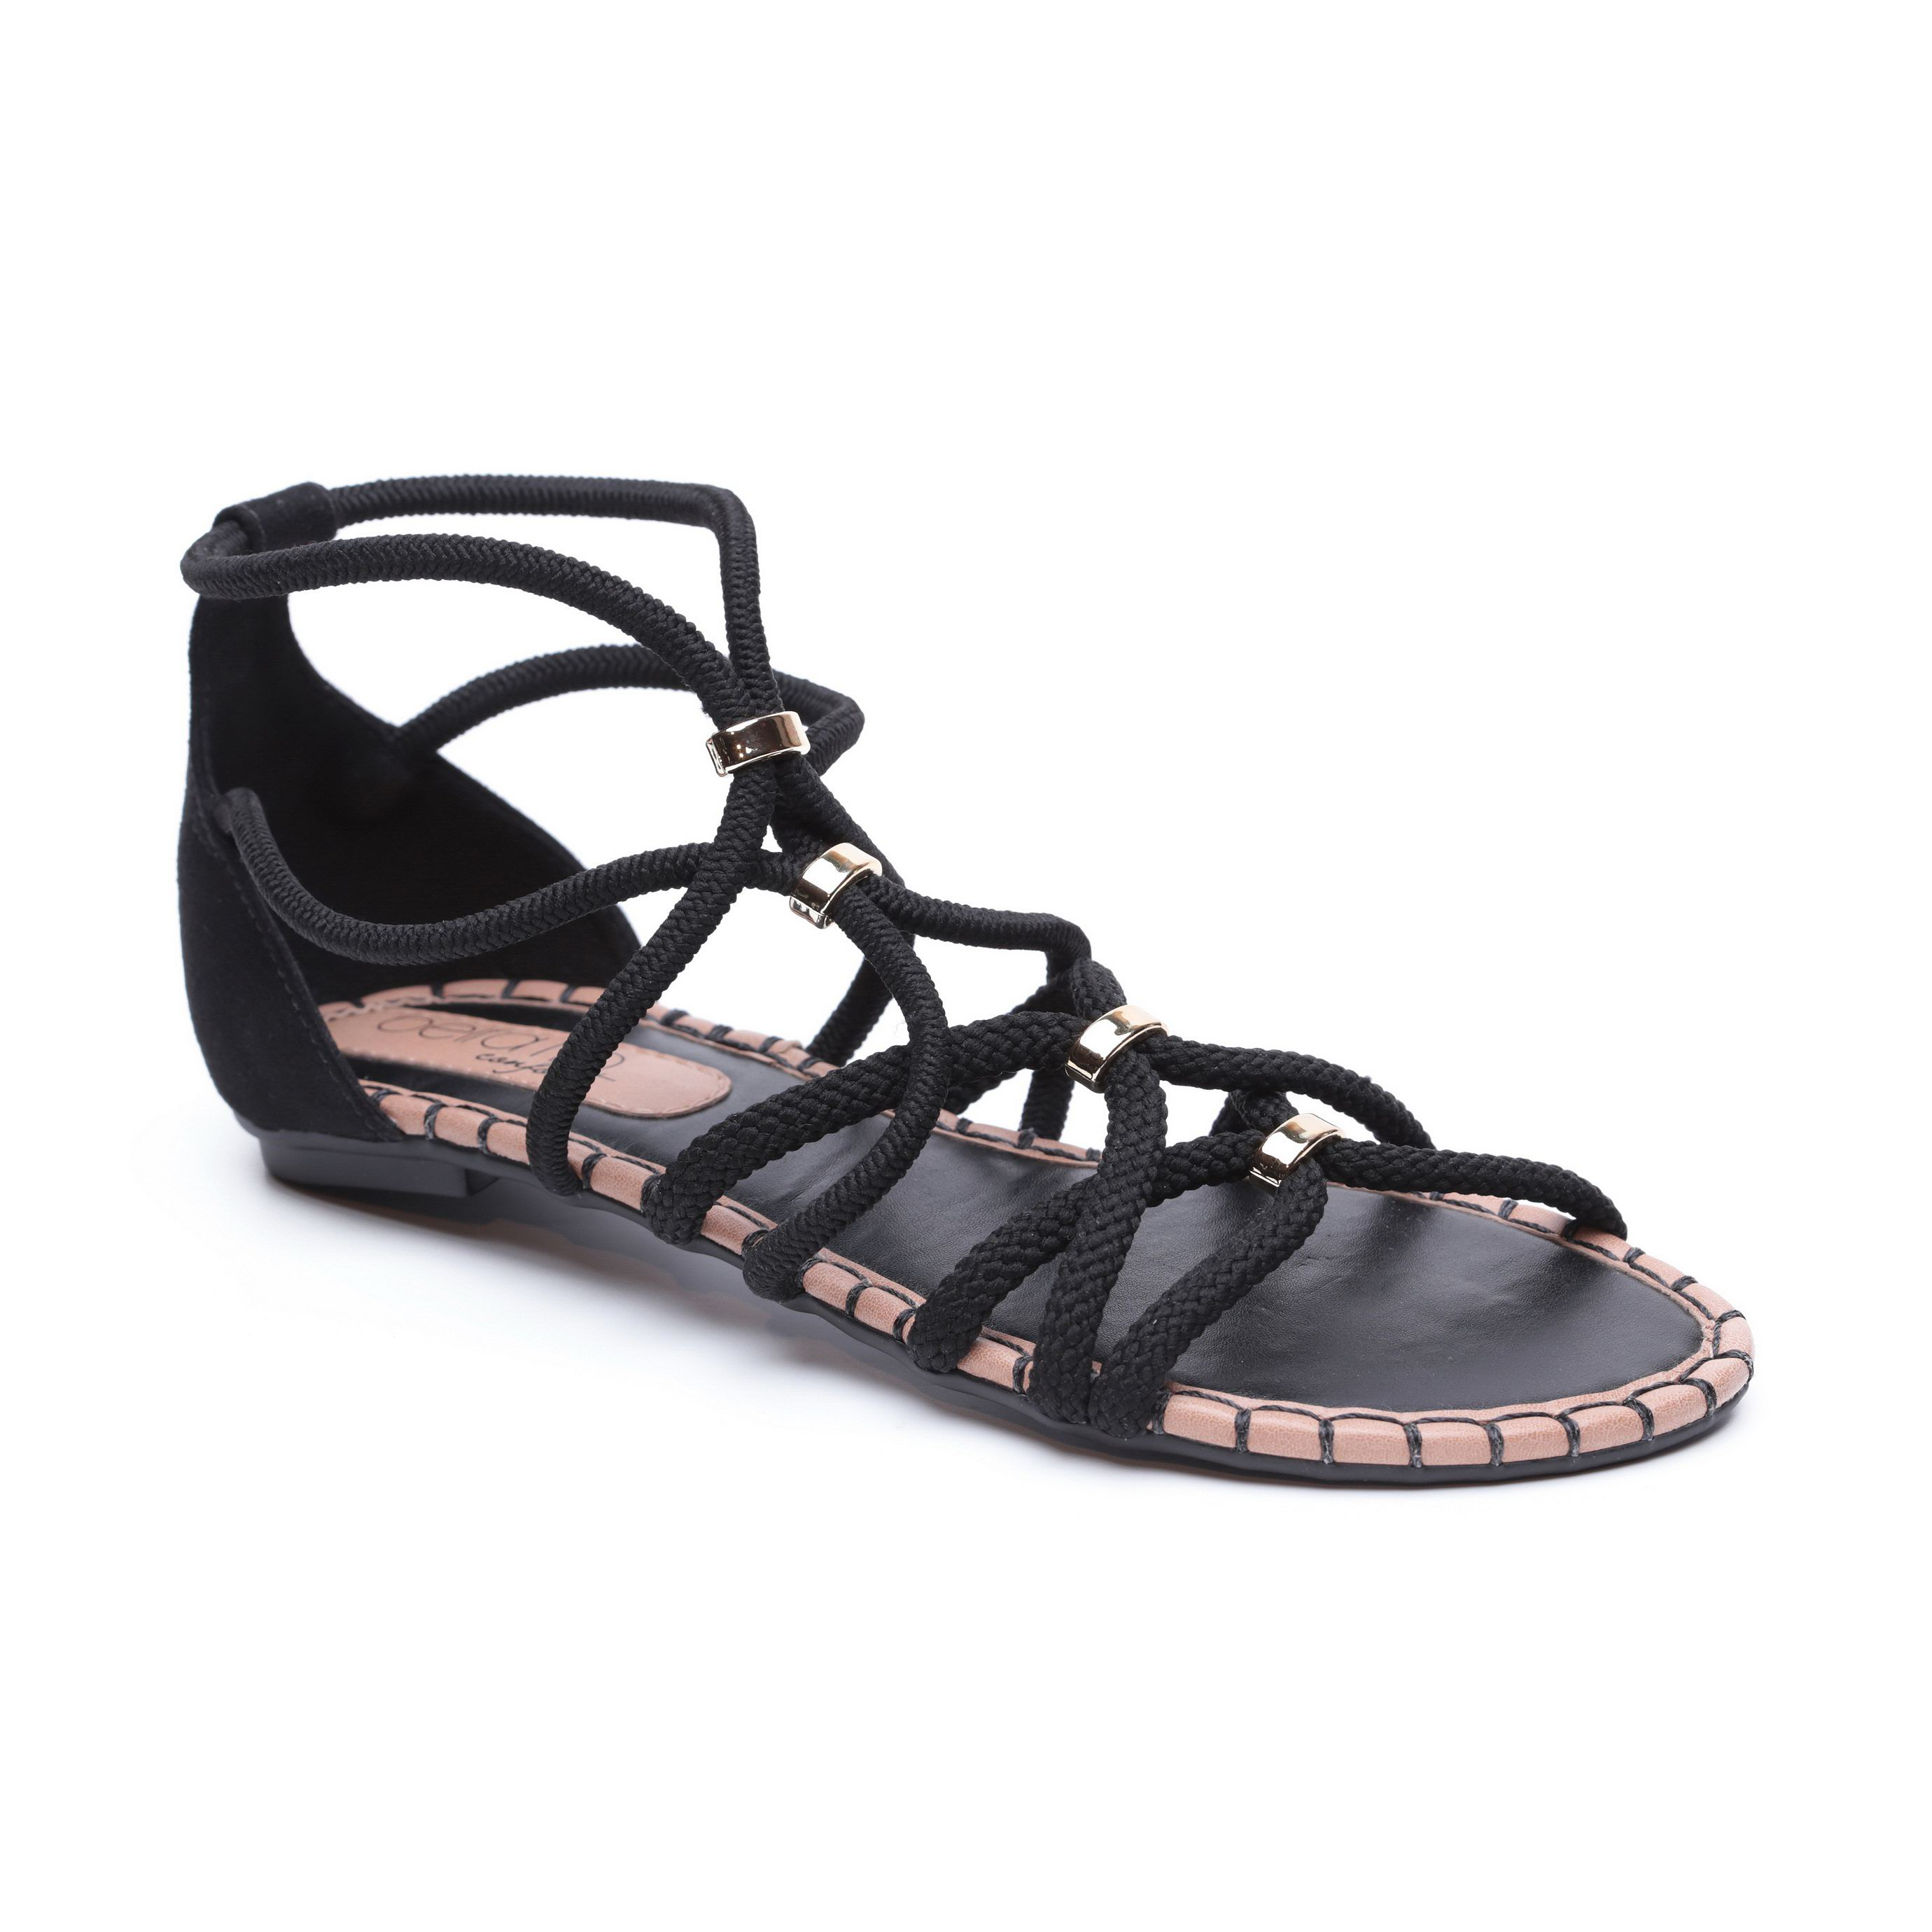 "Beira Rio - סנדל בסגנון תנכ""י לנשים בצבע שחור"